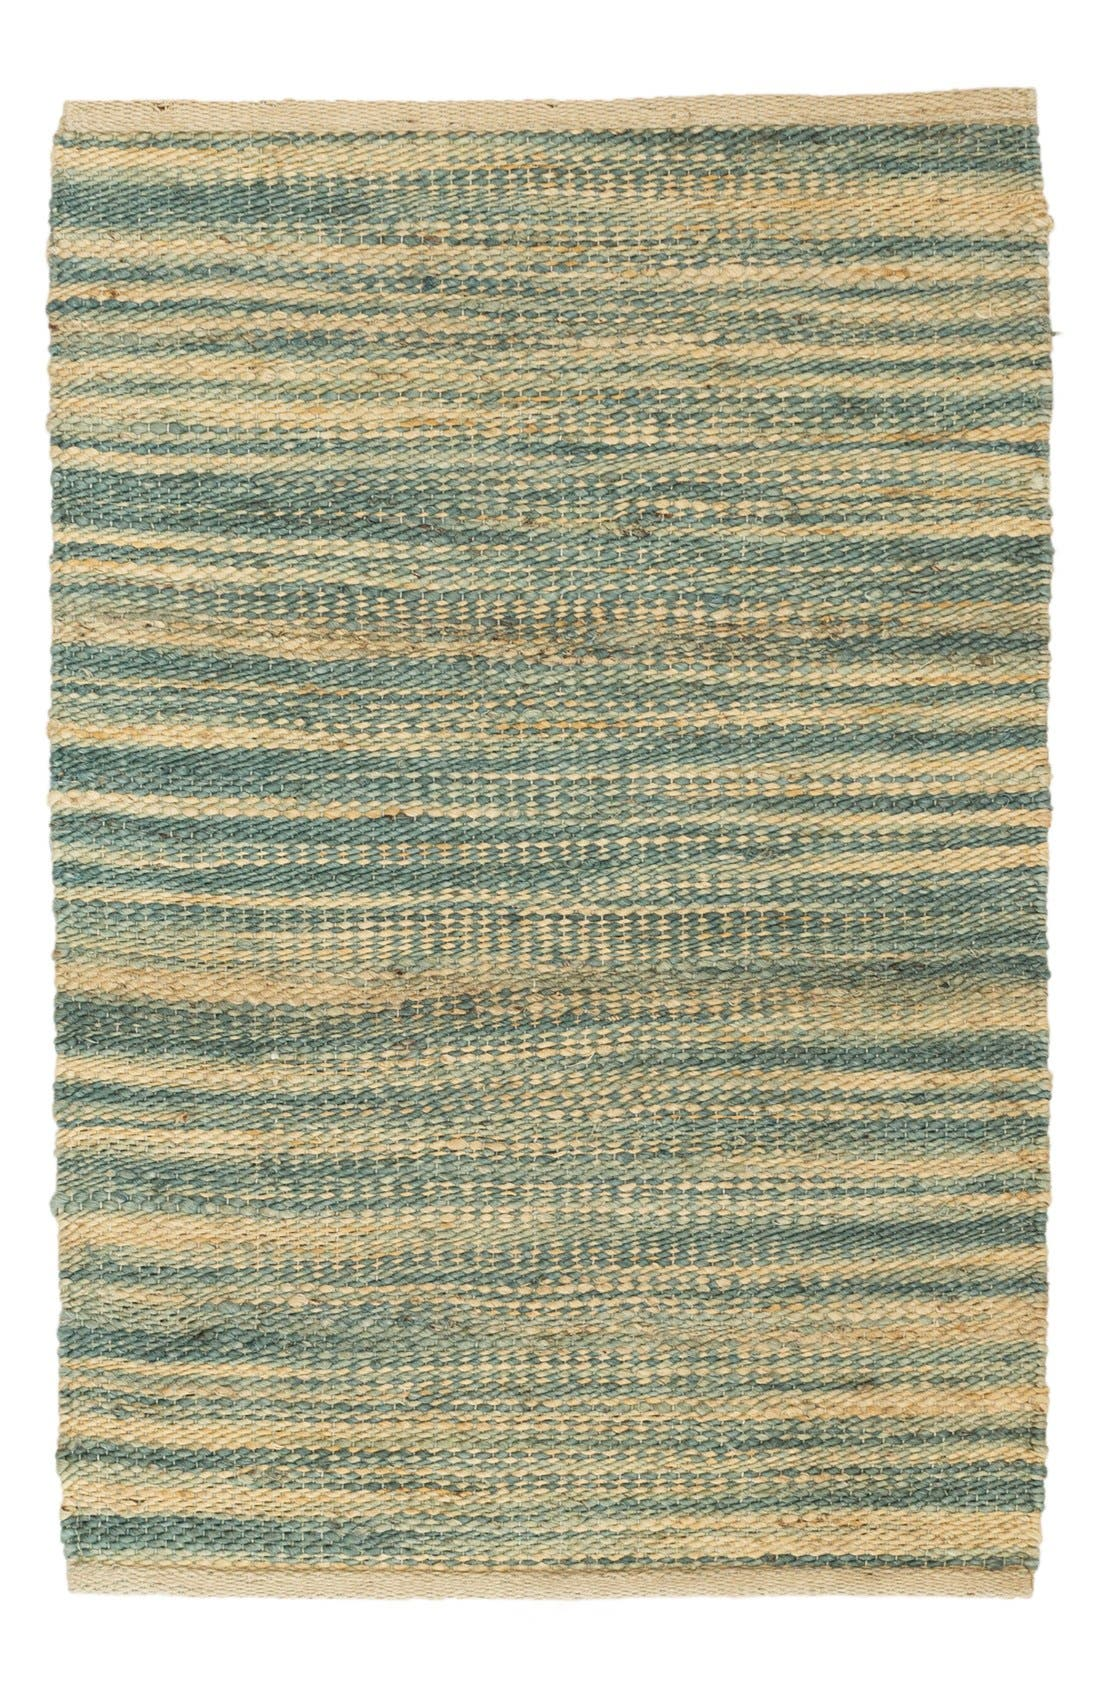 Haze Handwoven Rug,                             Main thumbnail 1, color,                             Blue